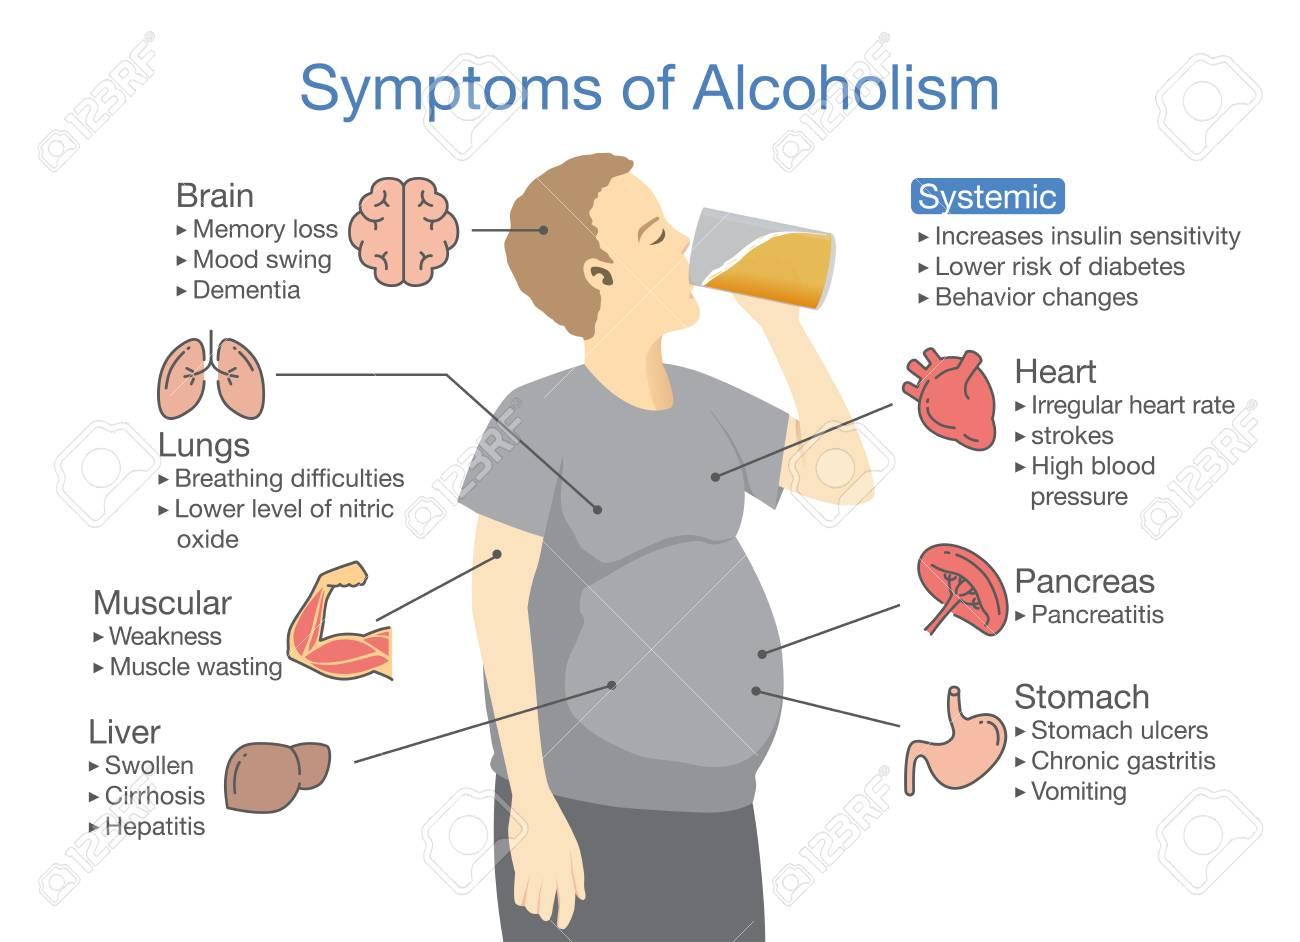 symptom of alcoholism patient illustration about health problemsymptom of alcoholism patient illustration about health problem of people with alcohol addiction stock